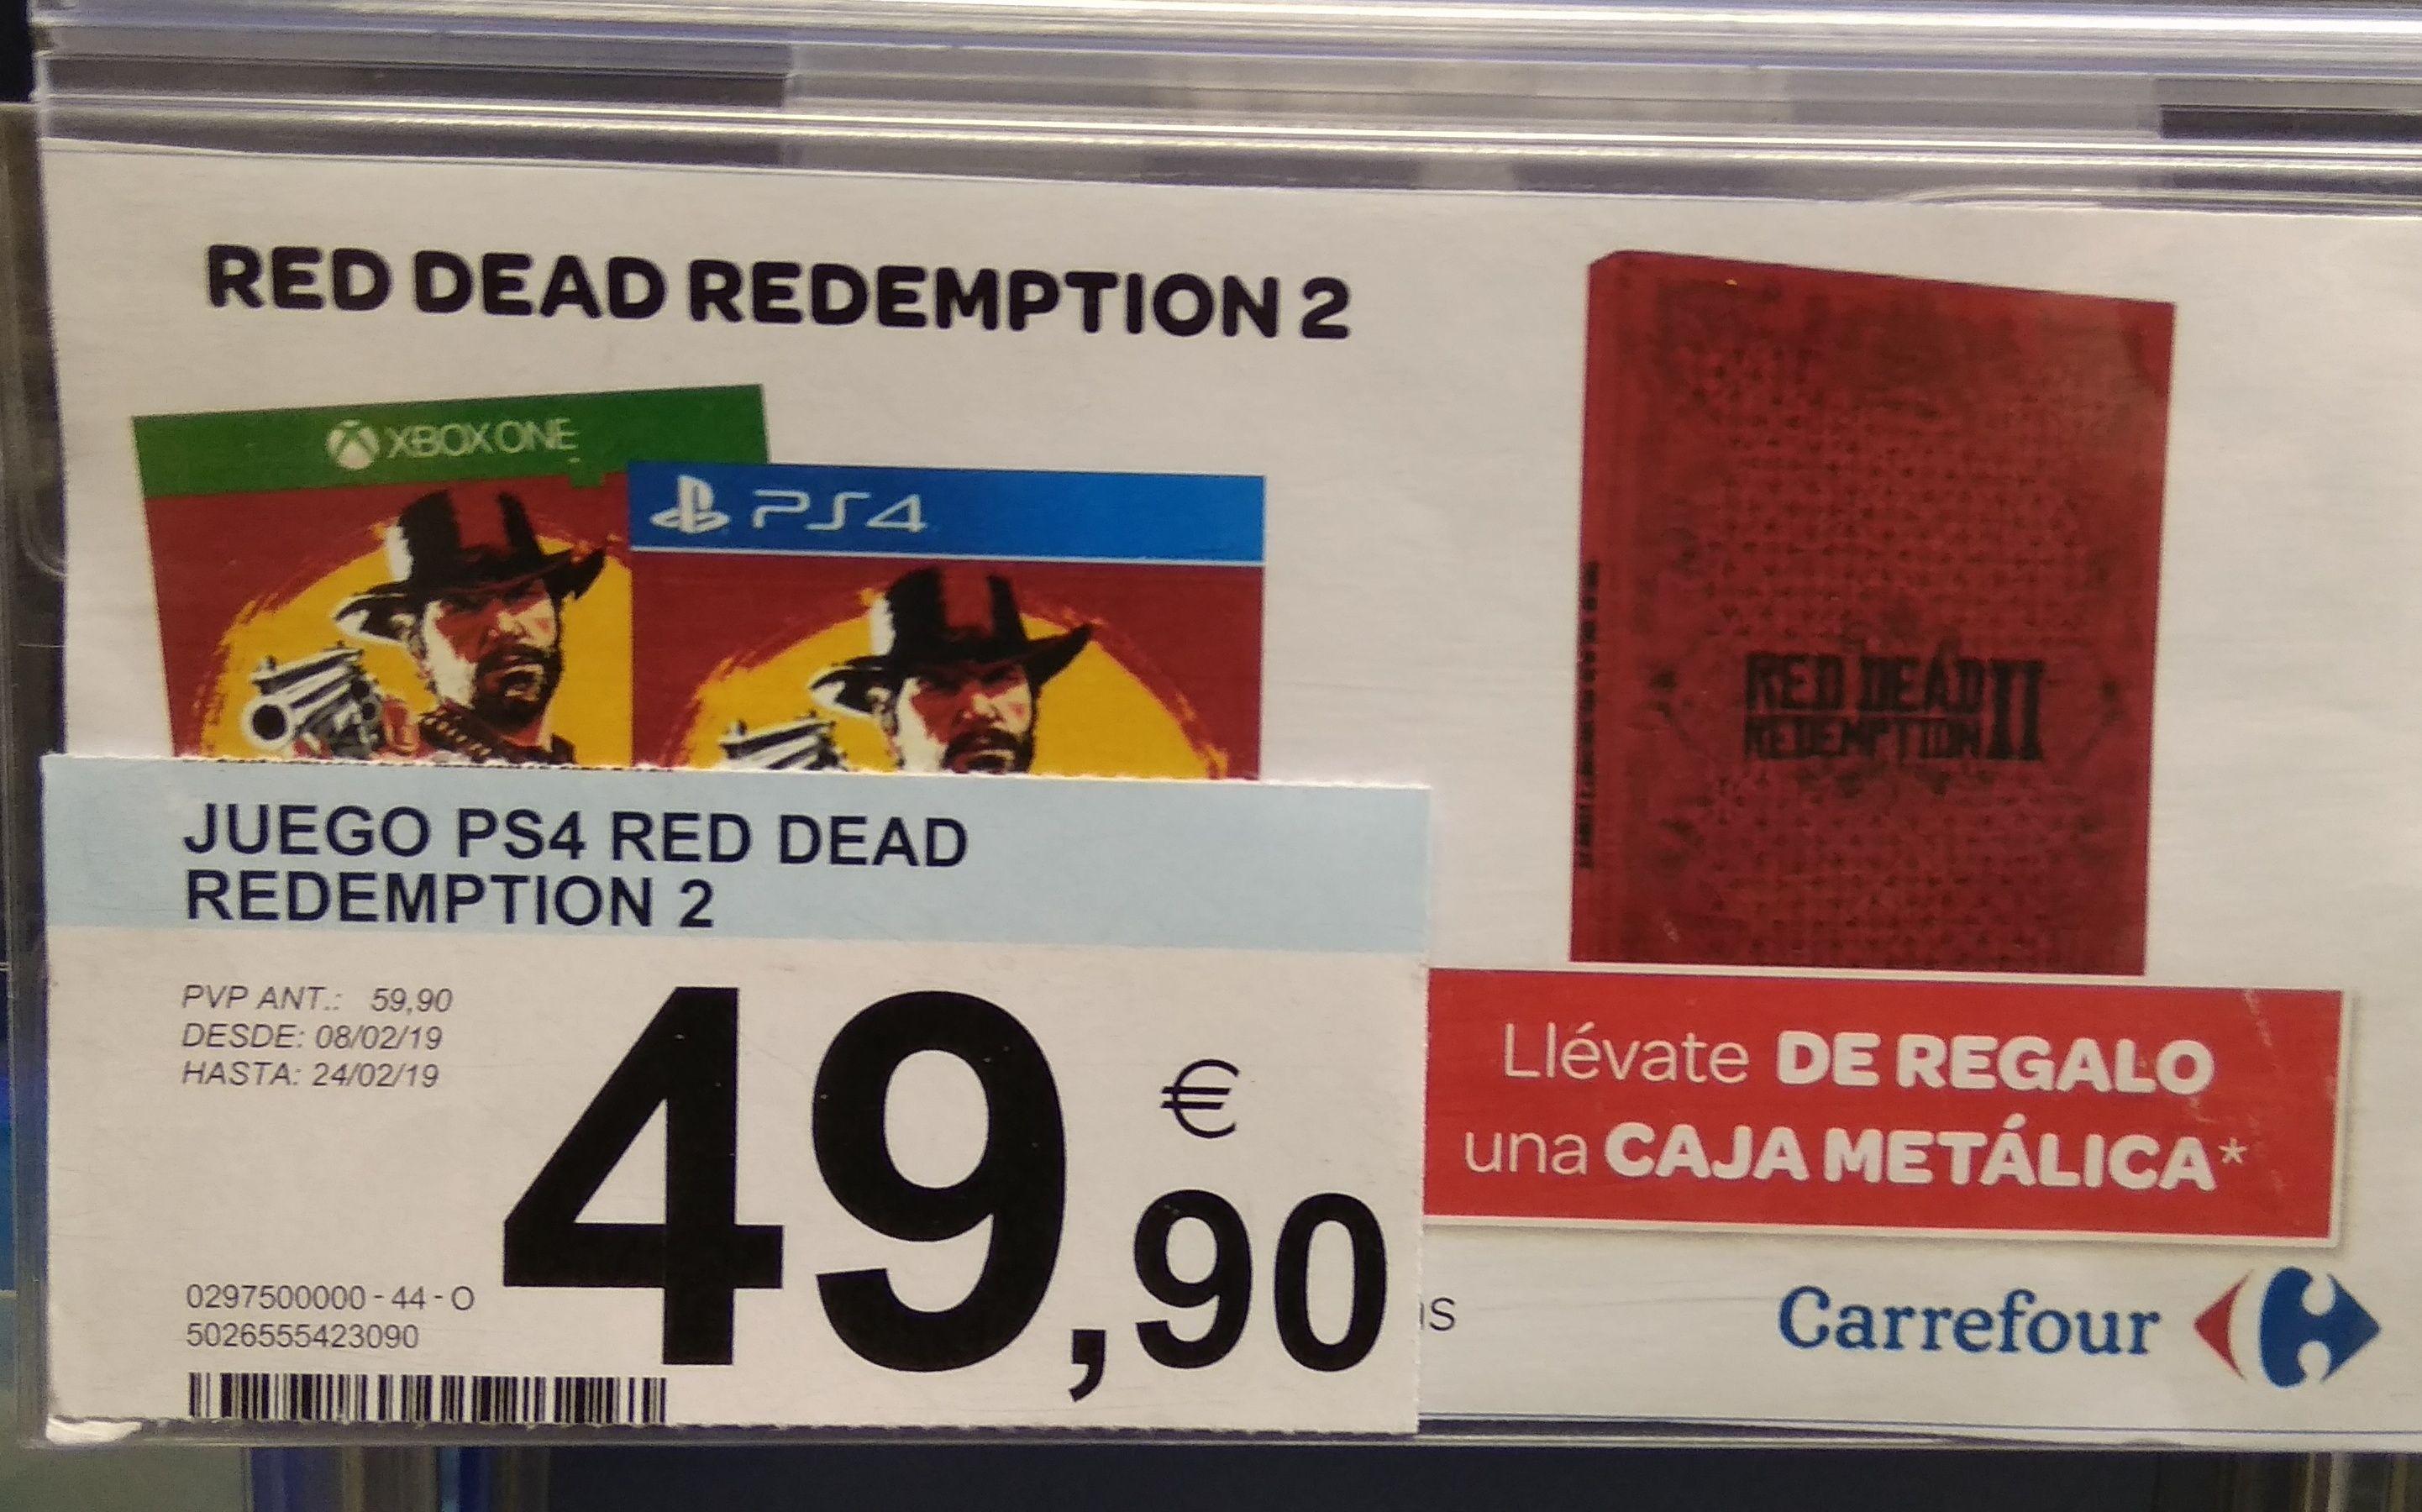 Red dead redemption 2 (PS4, XB1) + caja metálica (Carrefour Madrid Mar de Cristal)